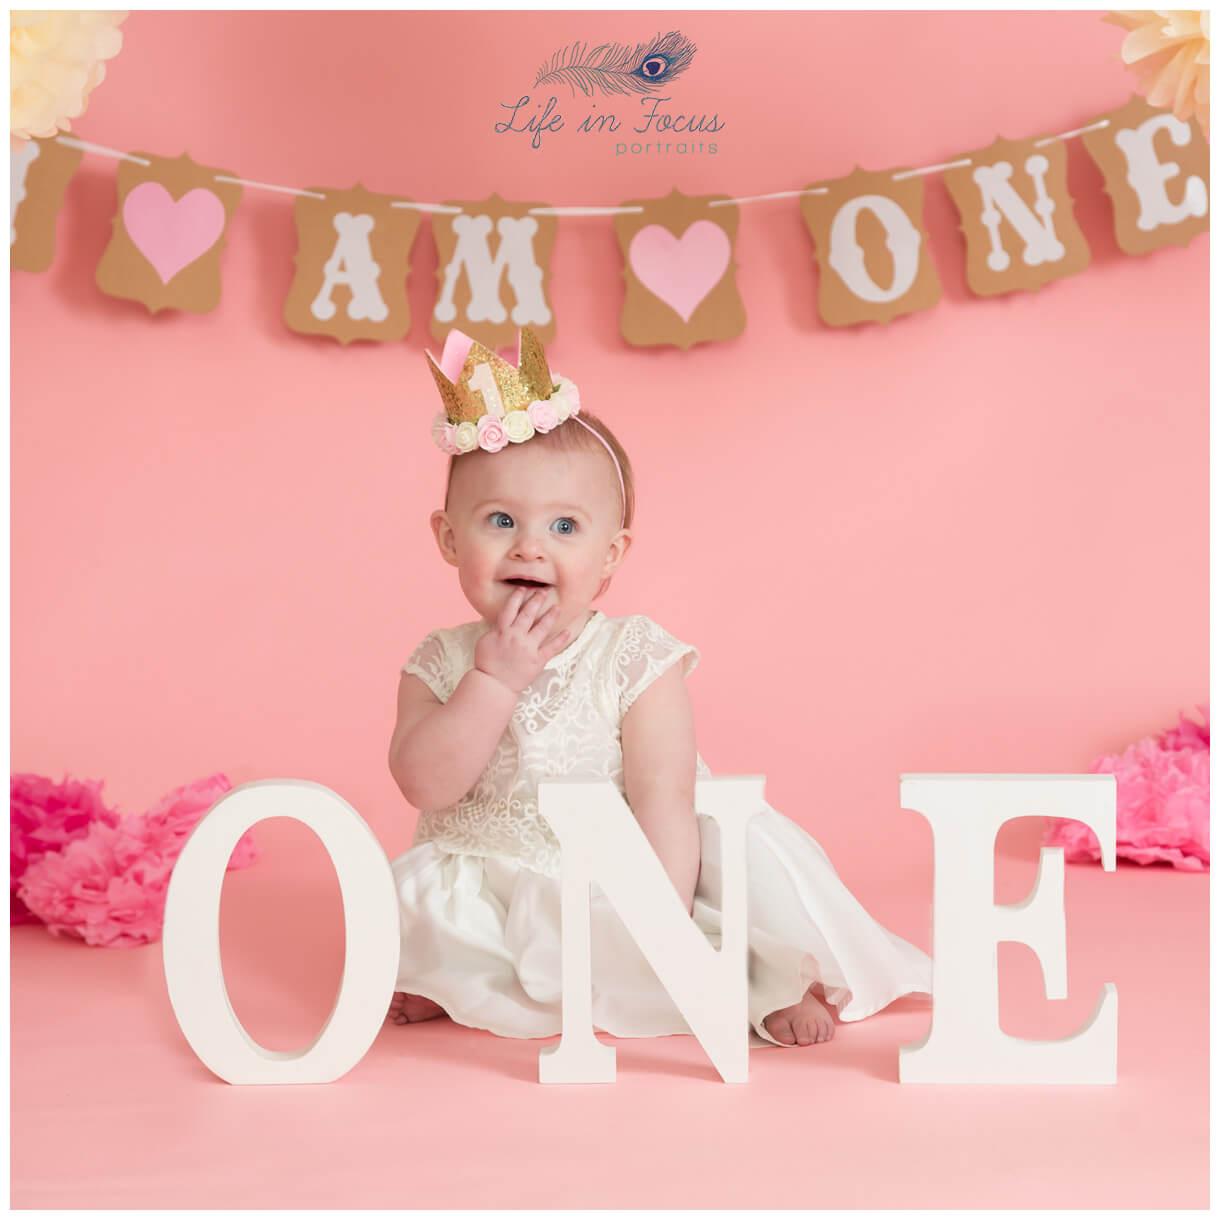 cute photo of baby gorl 1st Birthday photo shoot Rhu Life in Focus Portriats baby photography studio Helensburgh